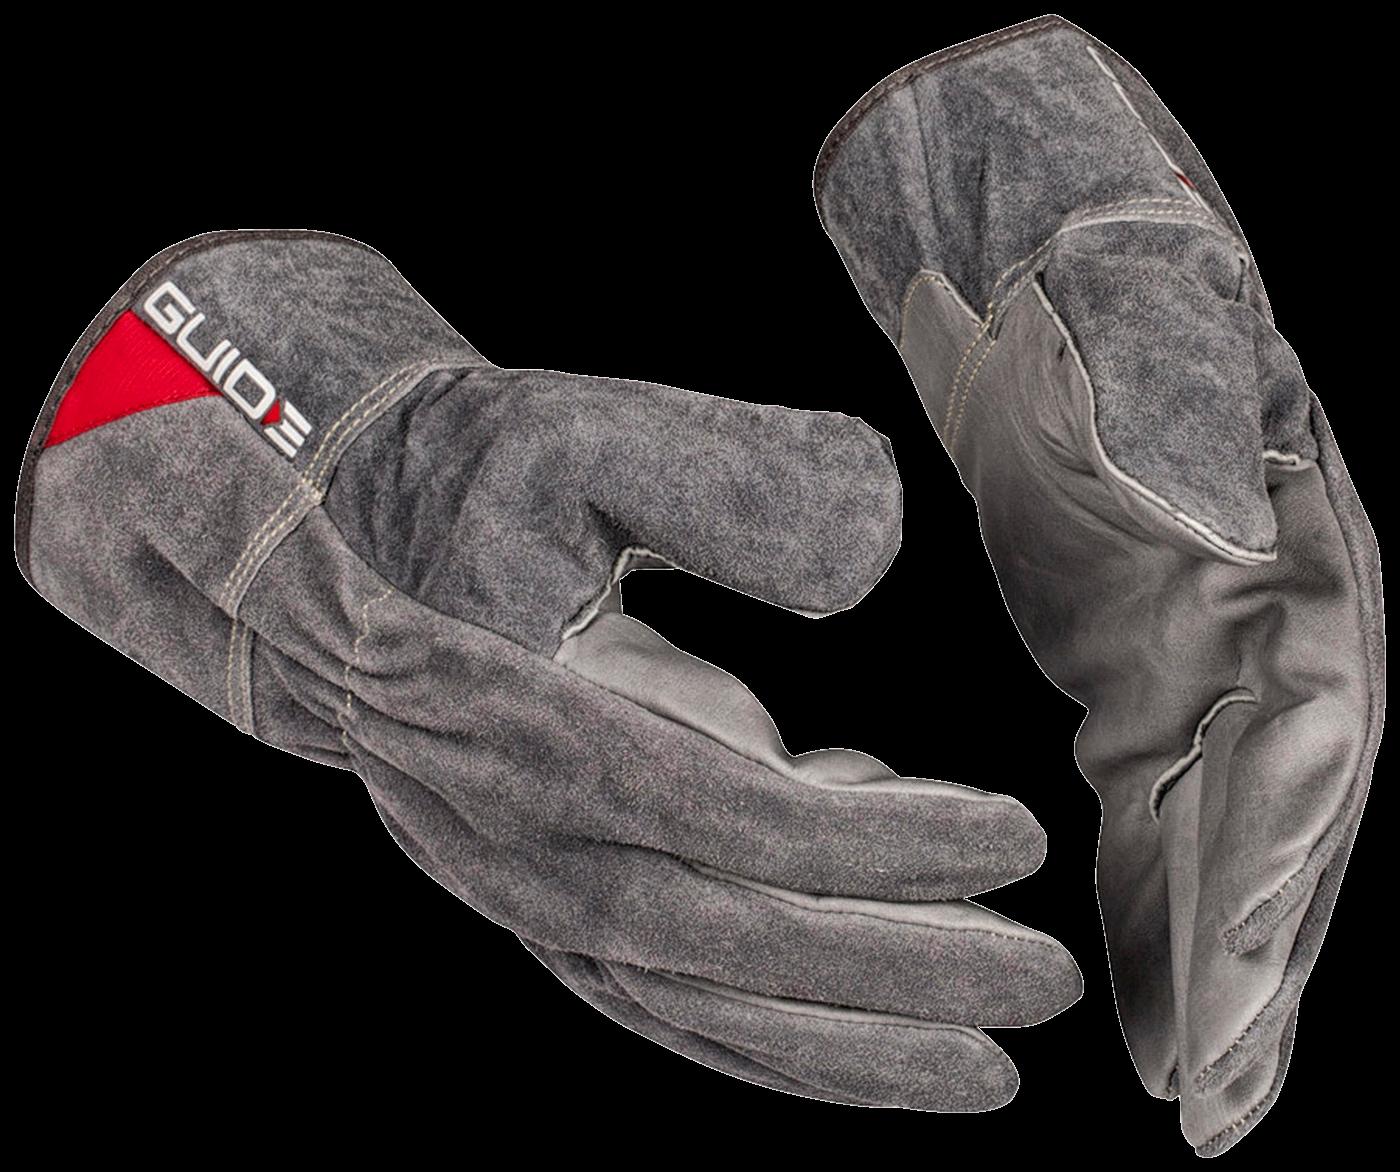 Heavyweight Working Glove GUIDE 1100